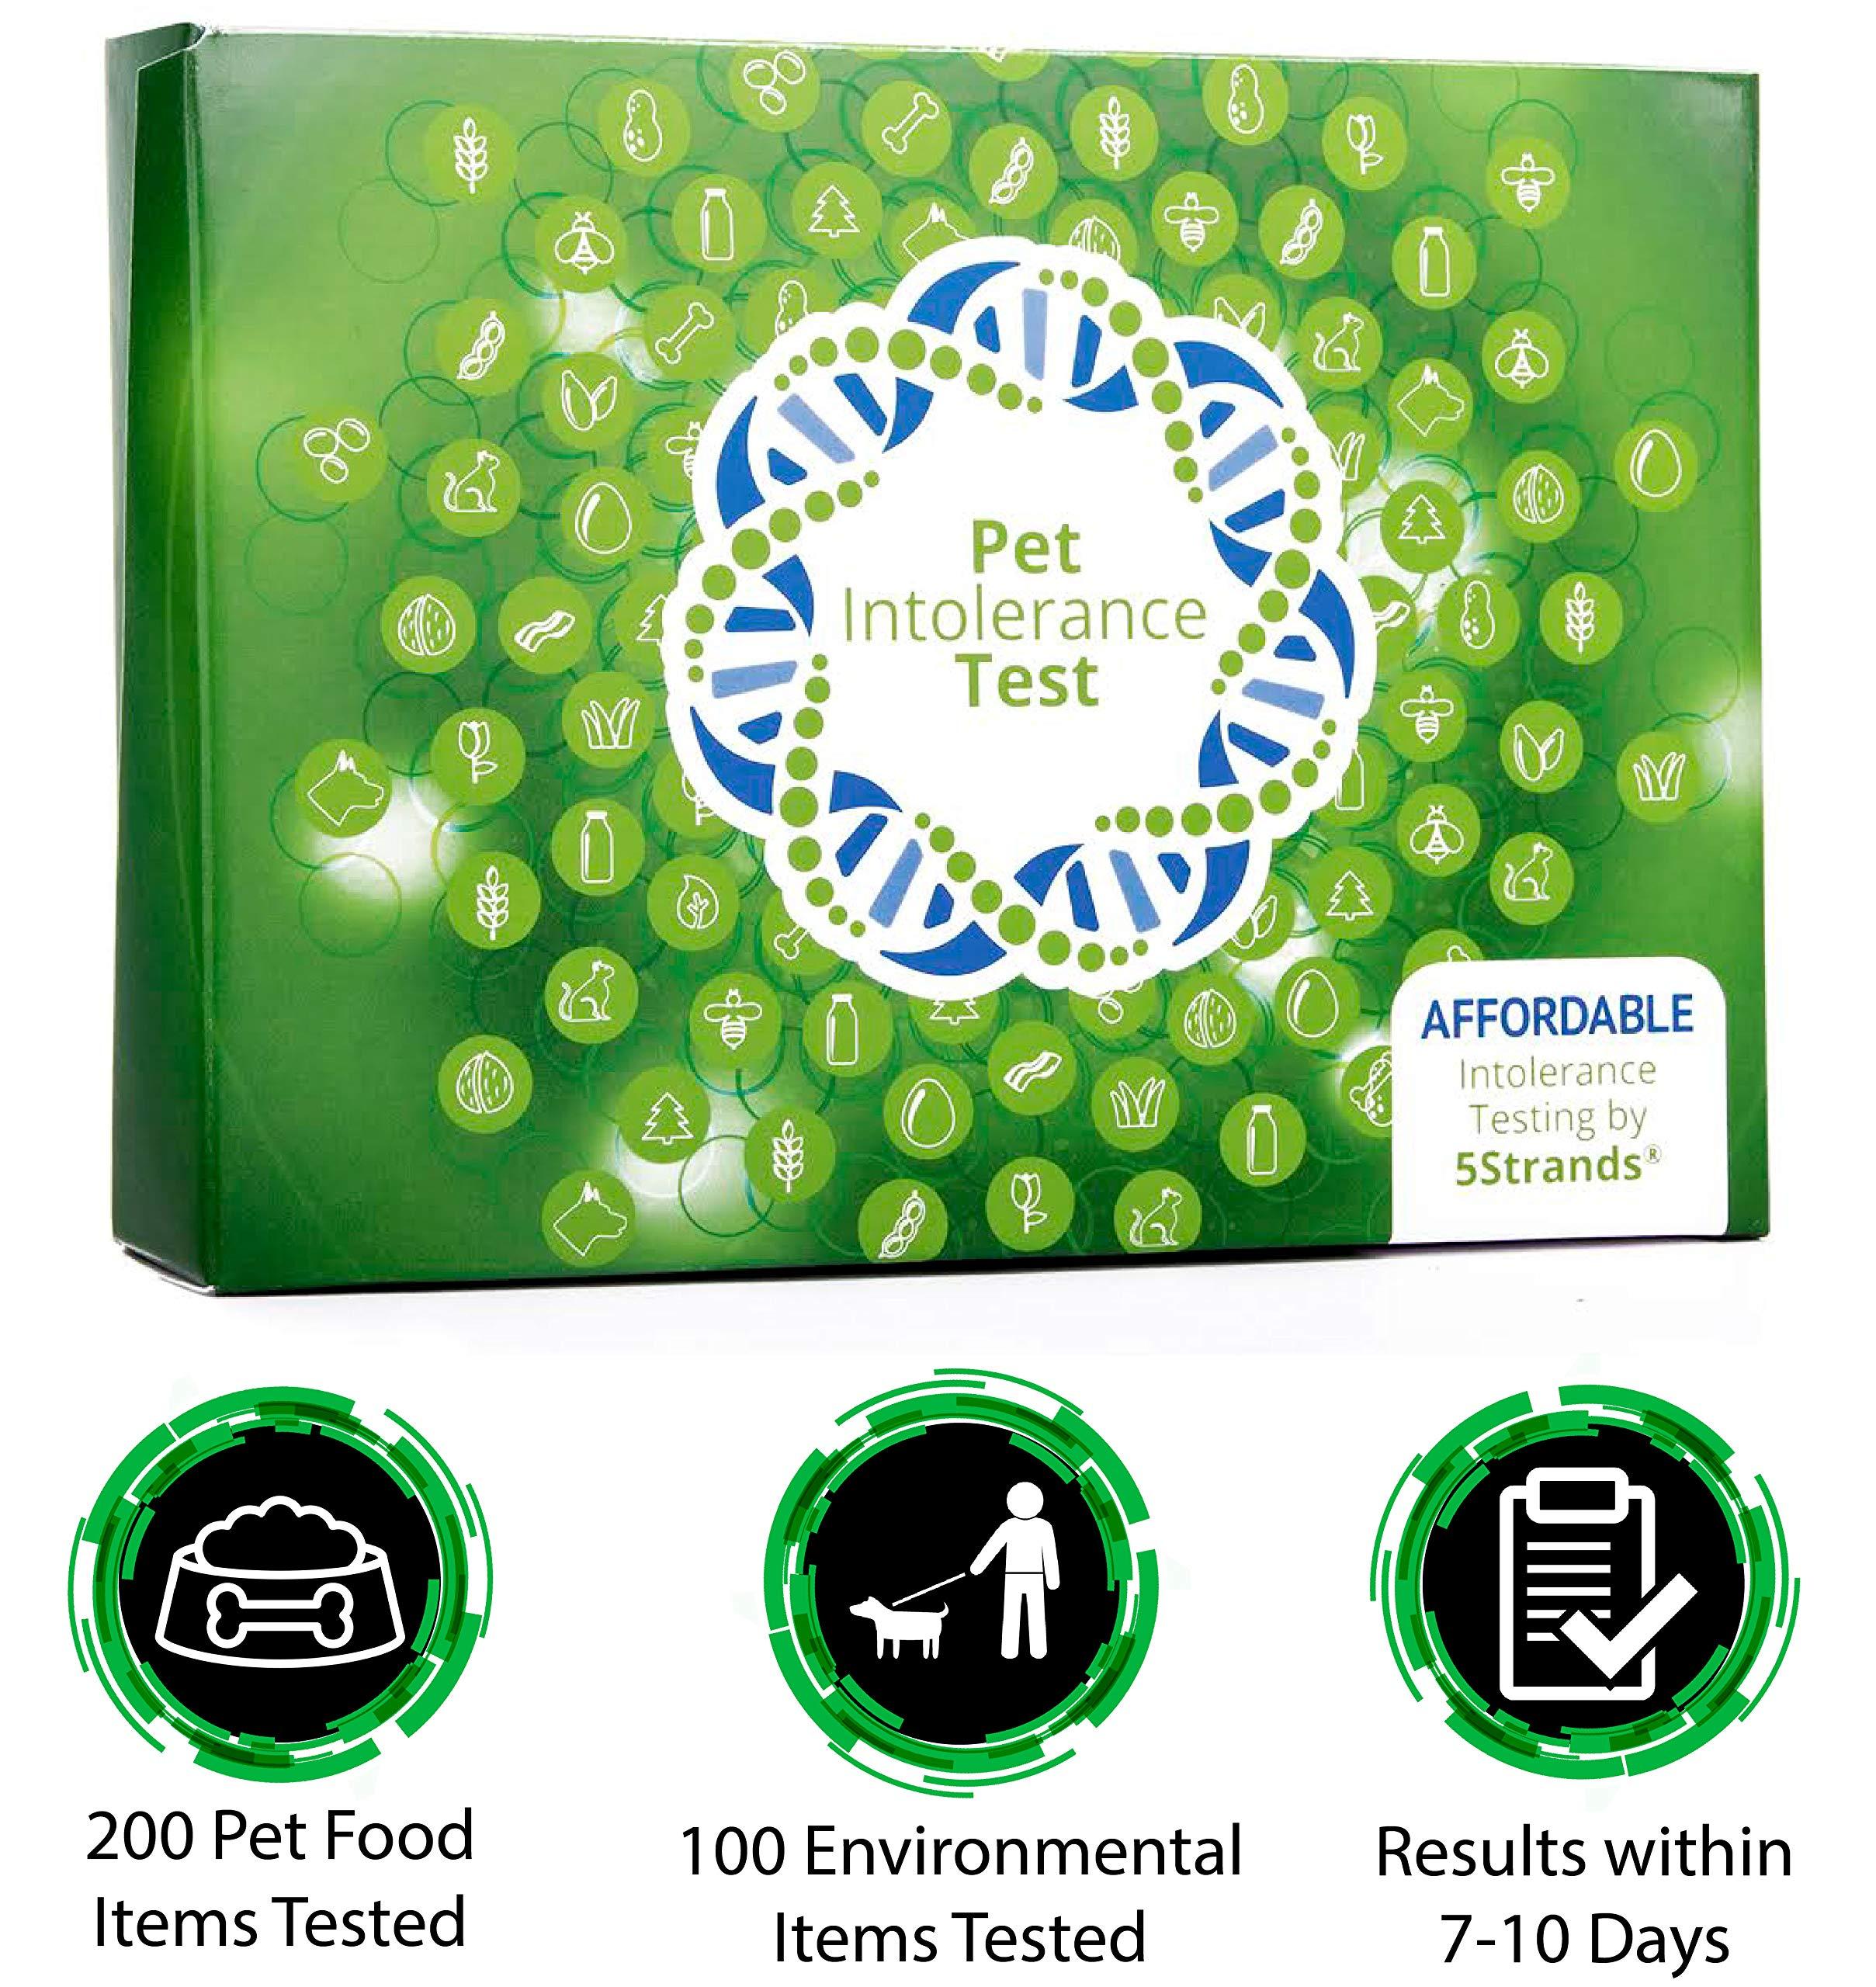 5Strands Sensitivity Intolerance Environmental Sensitivities